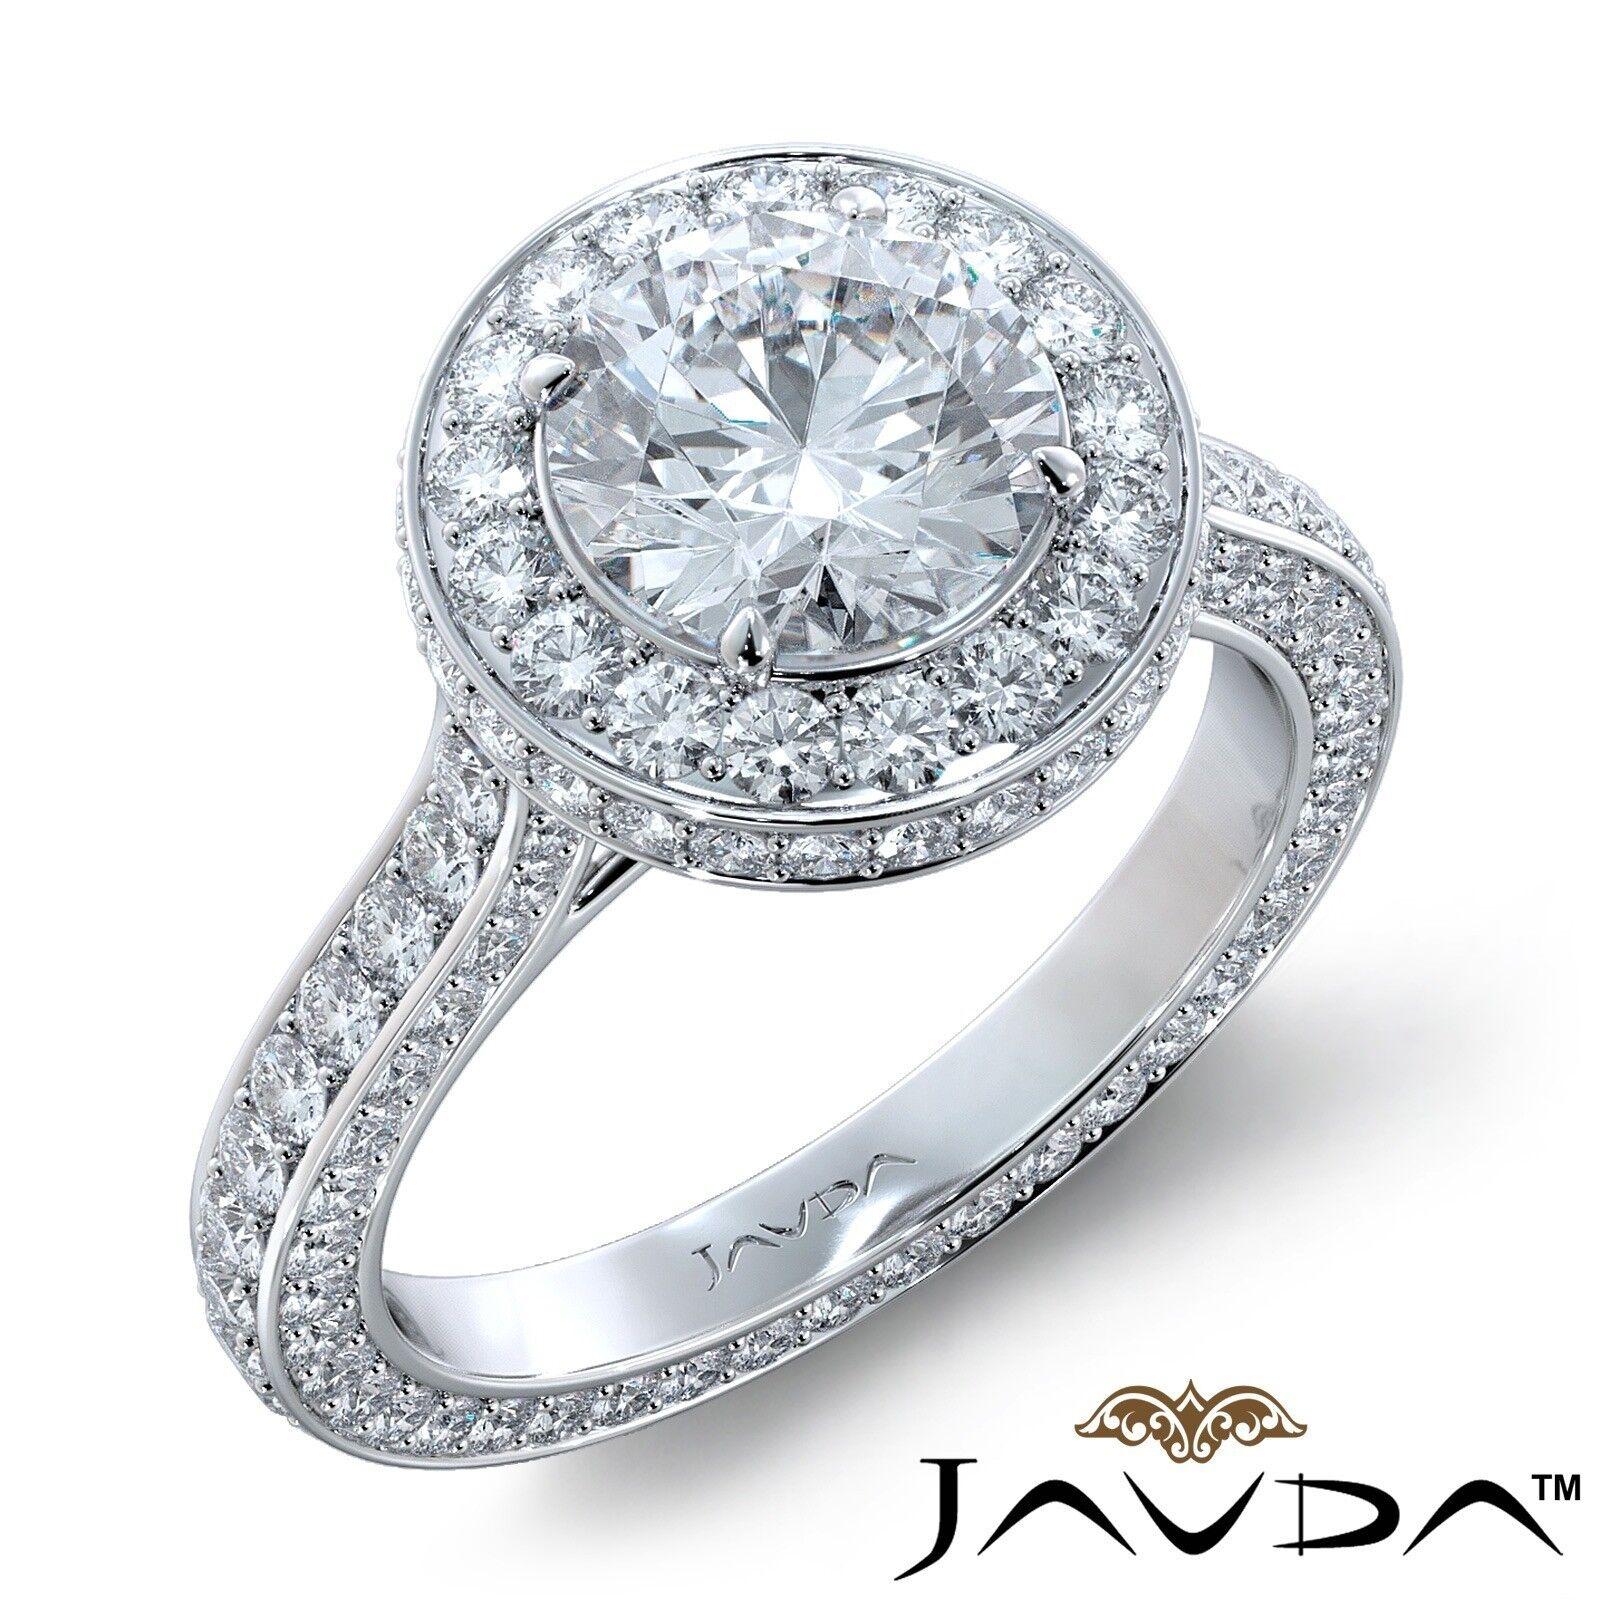 3.8ct Sidestone Eternity Halo Round Diamond Engagement Ring GIA H-SI1 White Gold